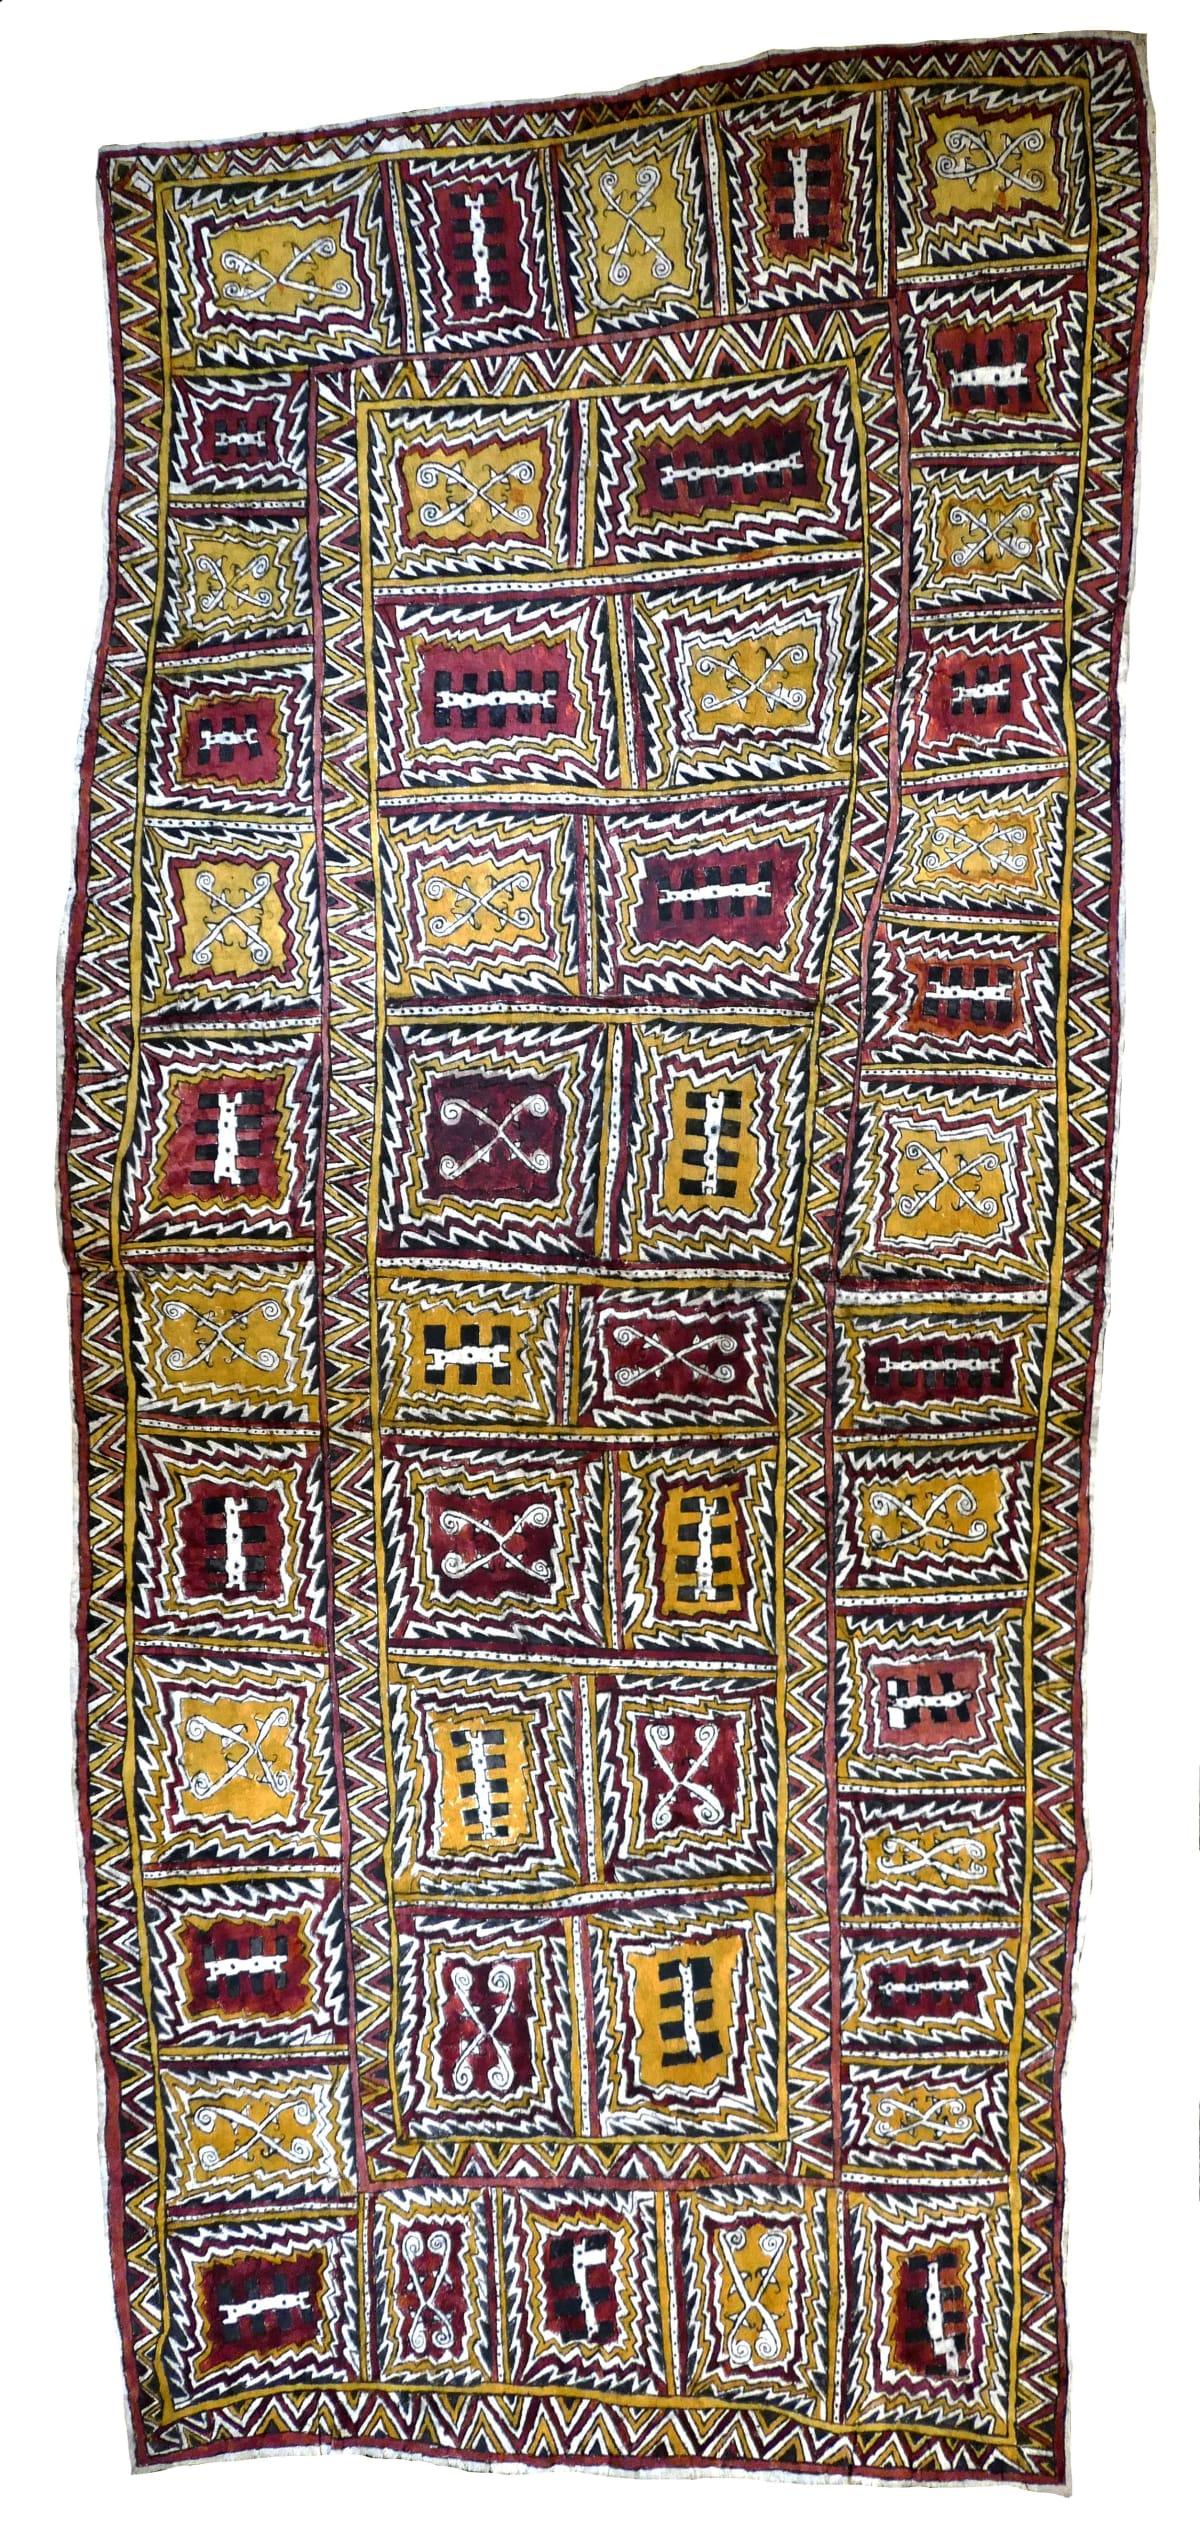 Diona Jonevari (Suwarari) Dahoru'e natural pigments on nioge (barkcloth) 146 x 63 cm